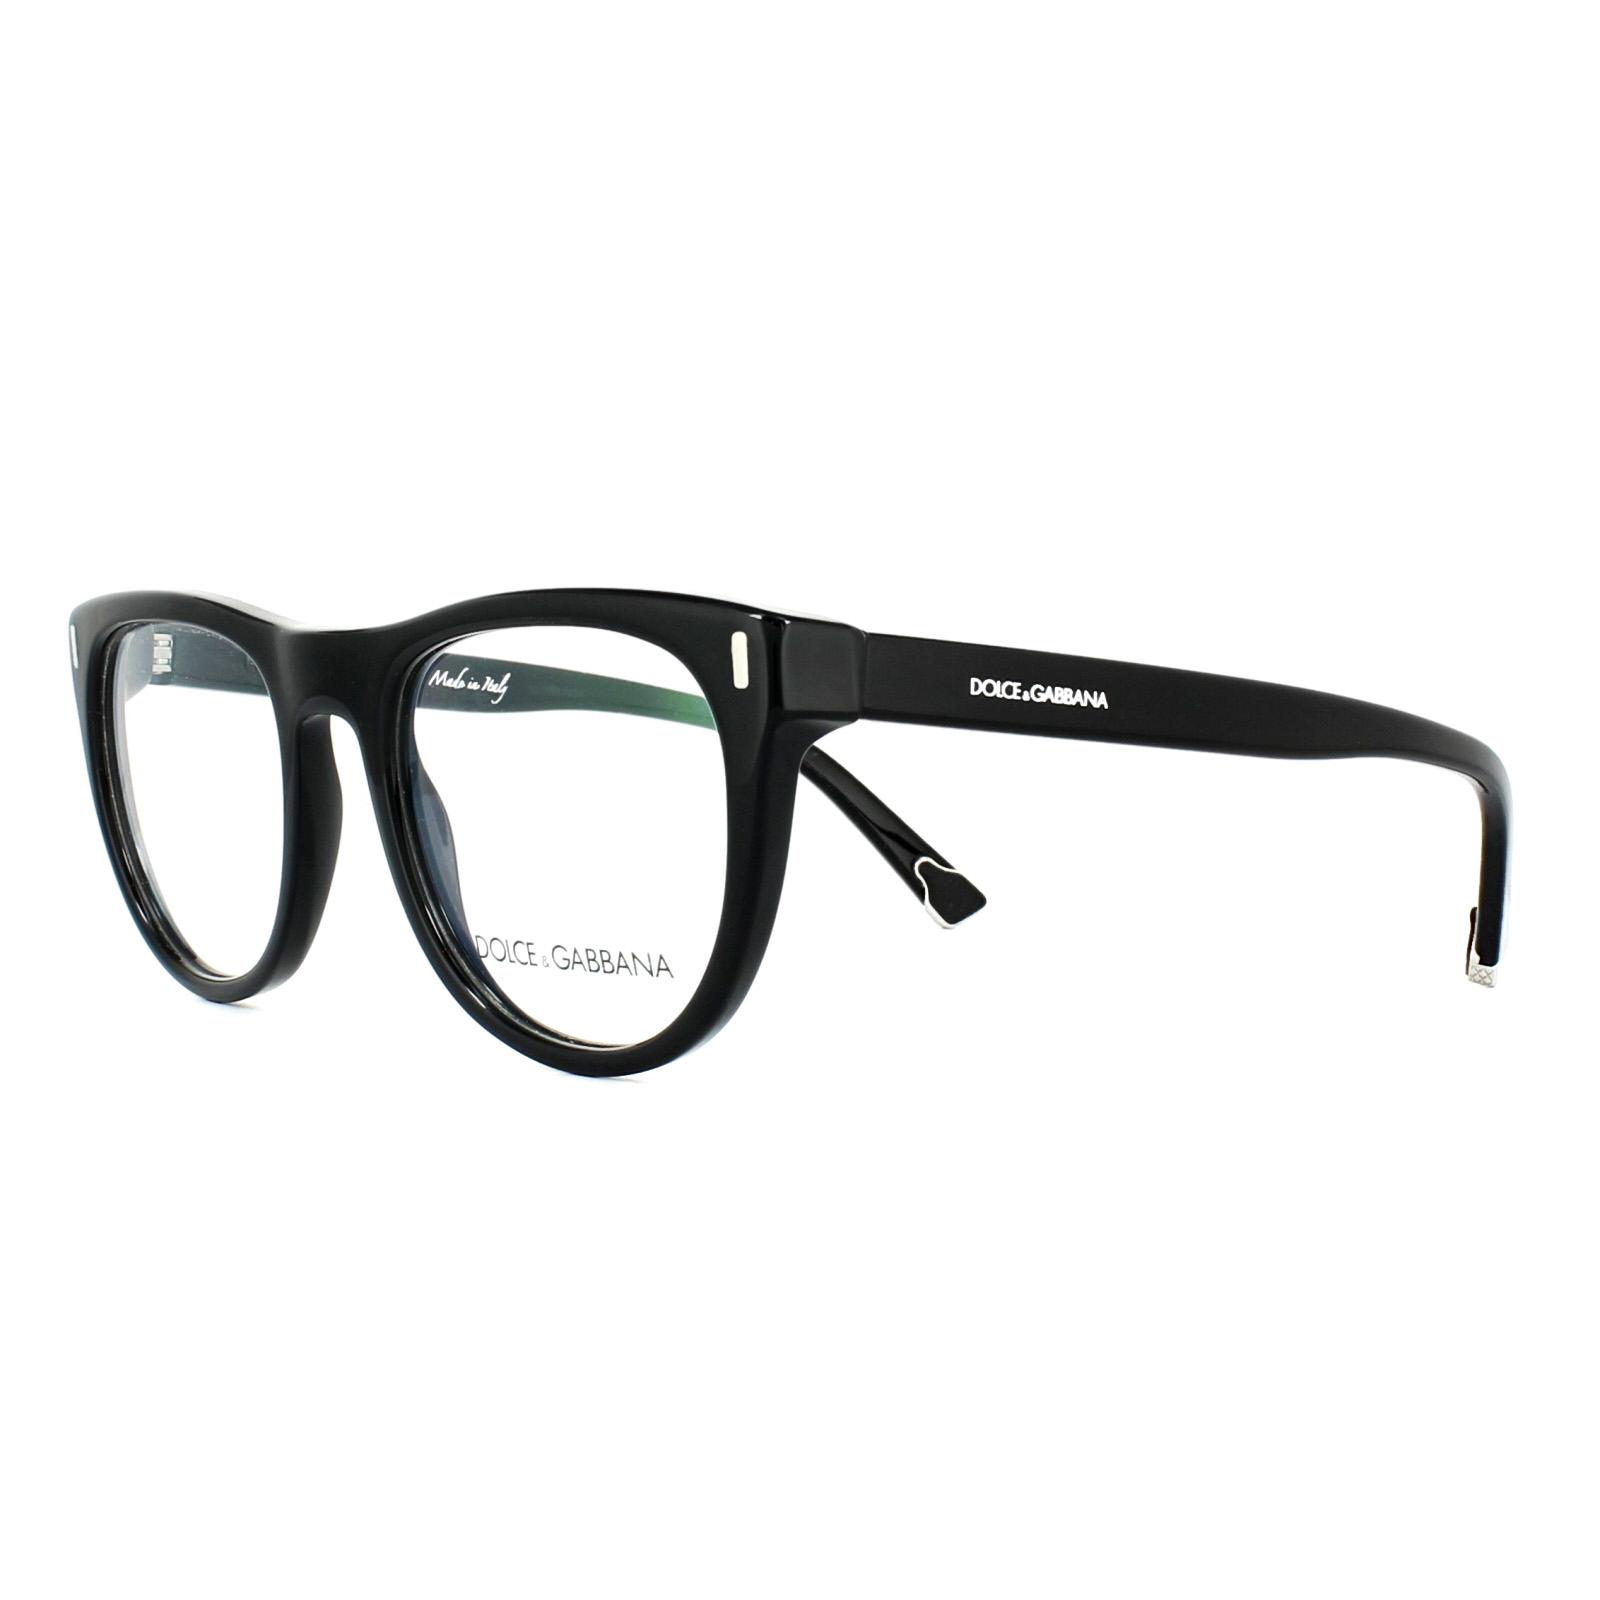 3e391dc9fbd Cheap Dolce   Gabbana DG 3248 Glasses Frames - Discounted Sunglasses